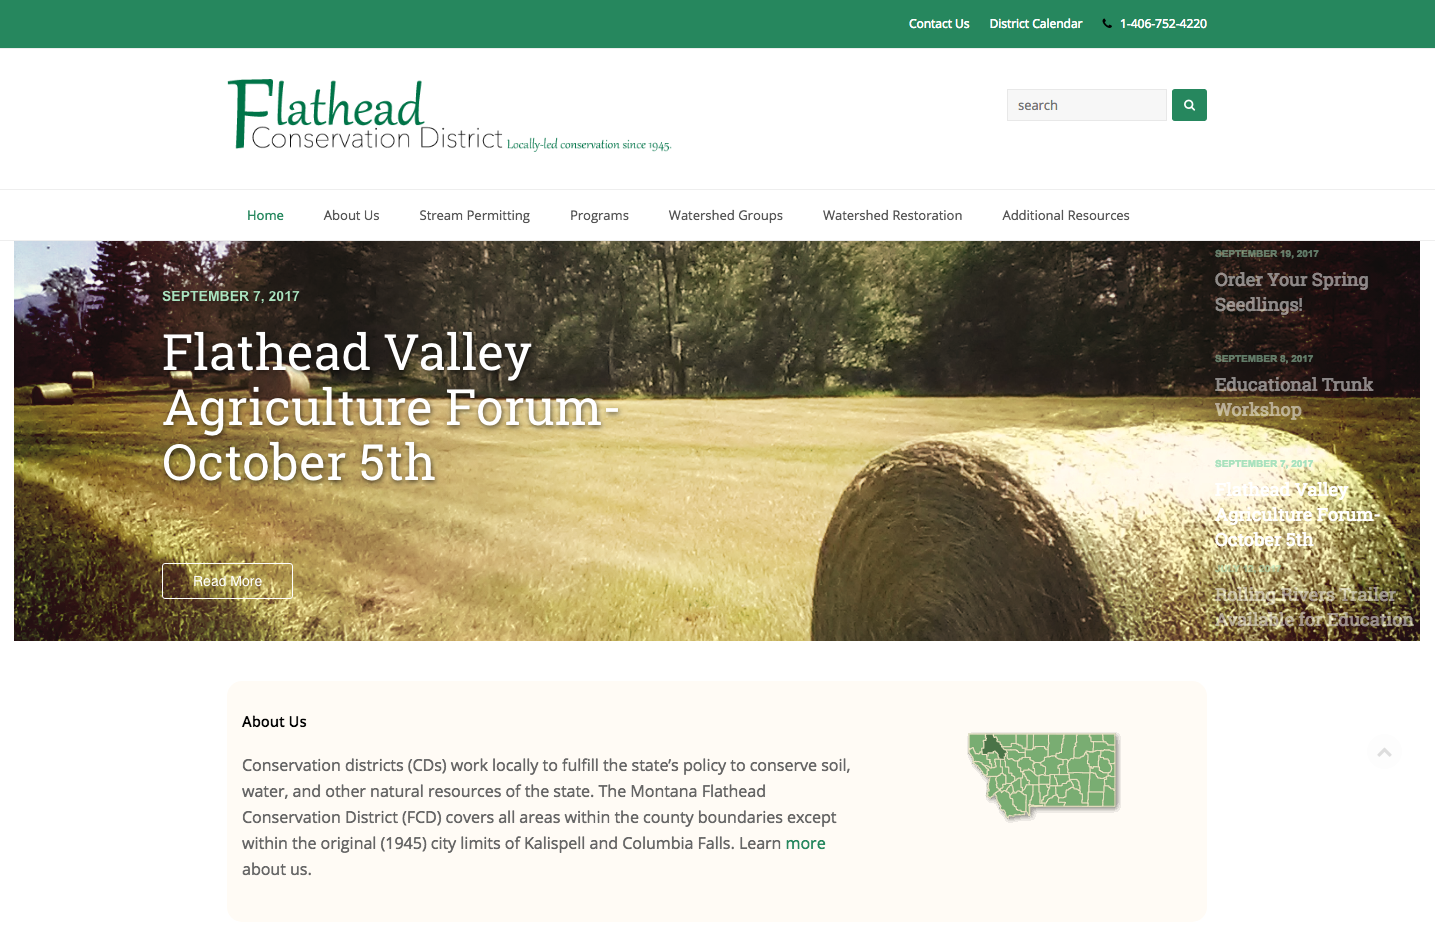 Flathead CD Website